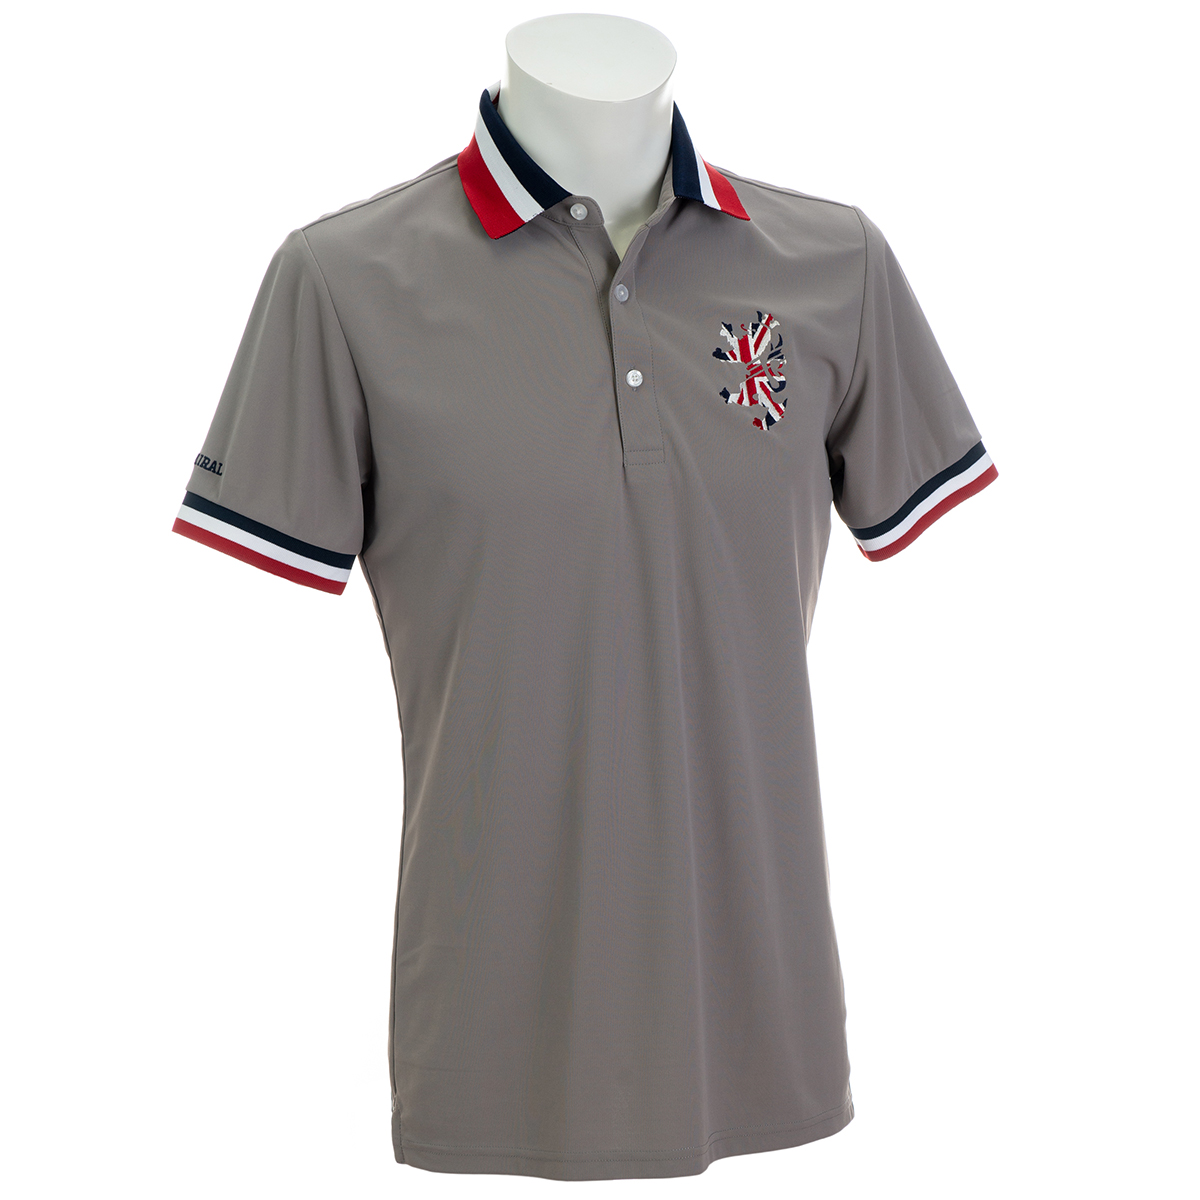 UJ襟 半袖ポロシャツ